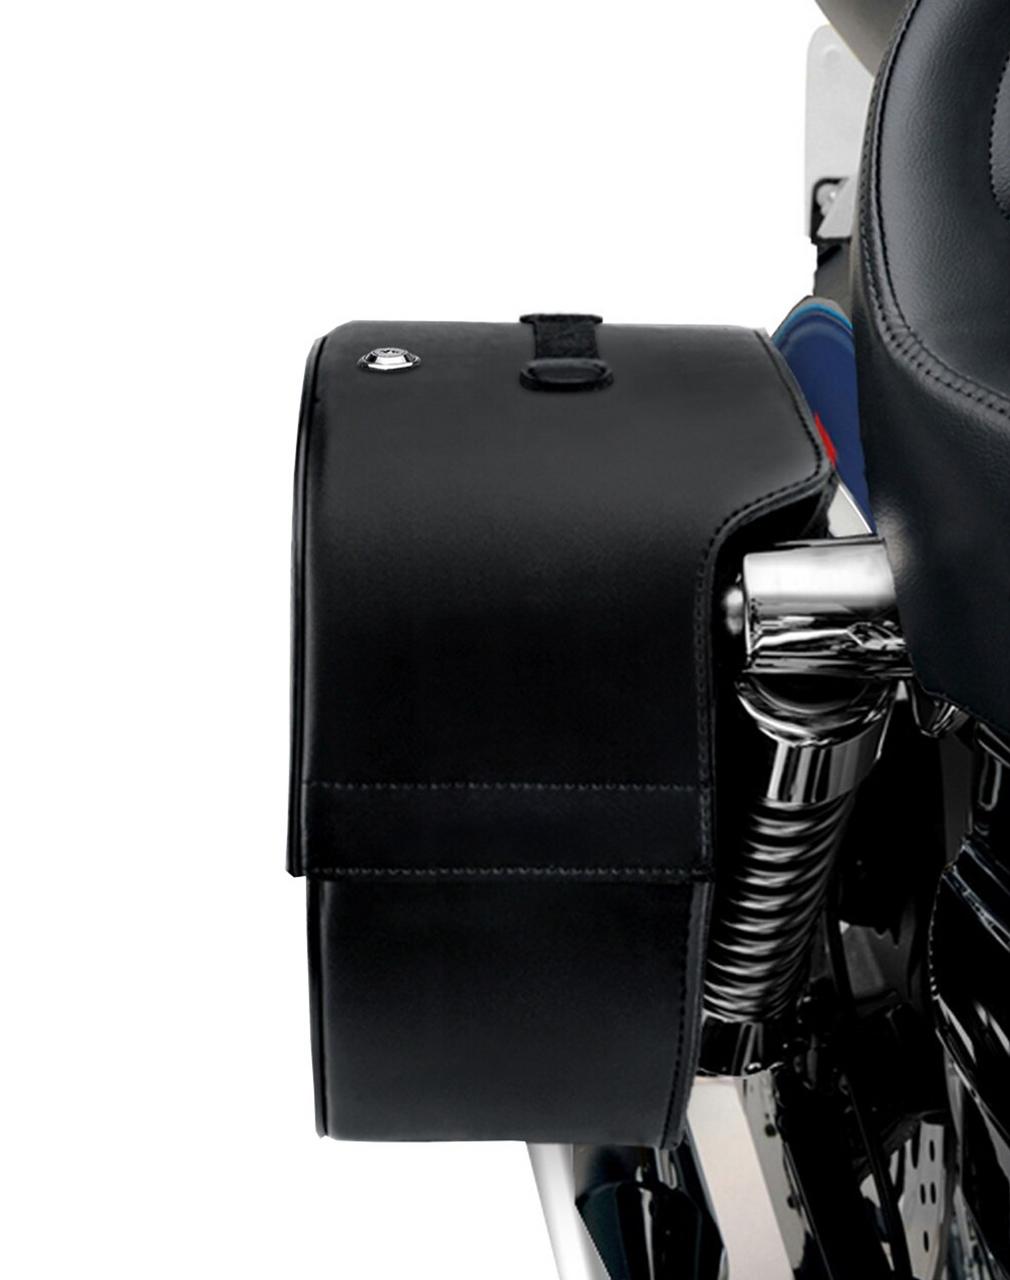 Honda VTX 1800 N Armor Shock Cutout Motorcycle Saddlebags Shock Cutout View